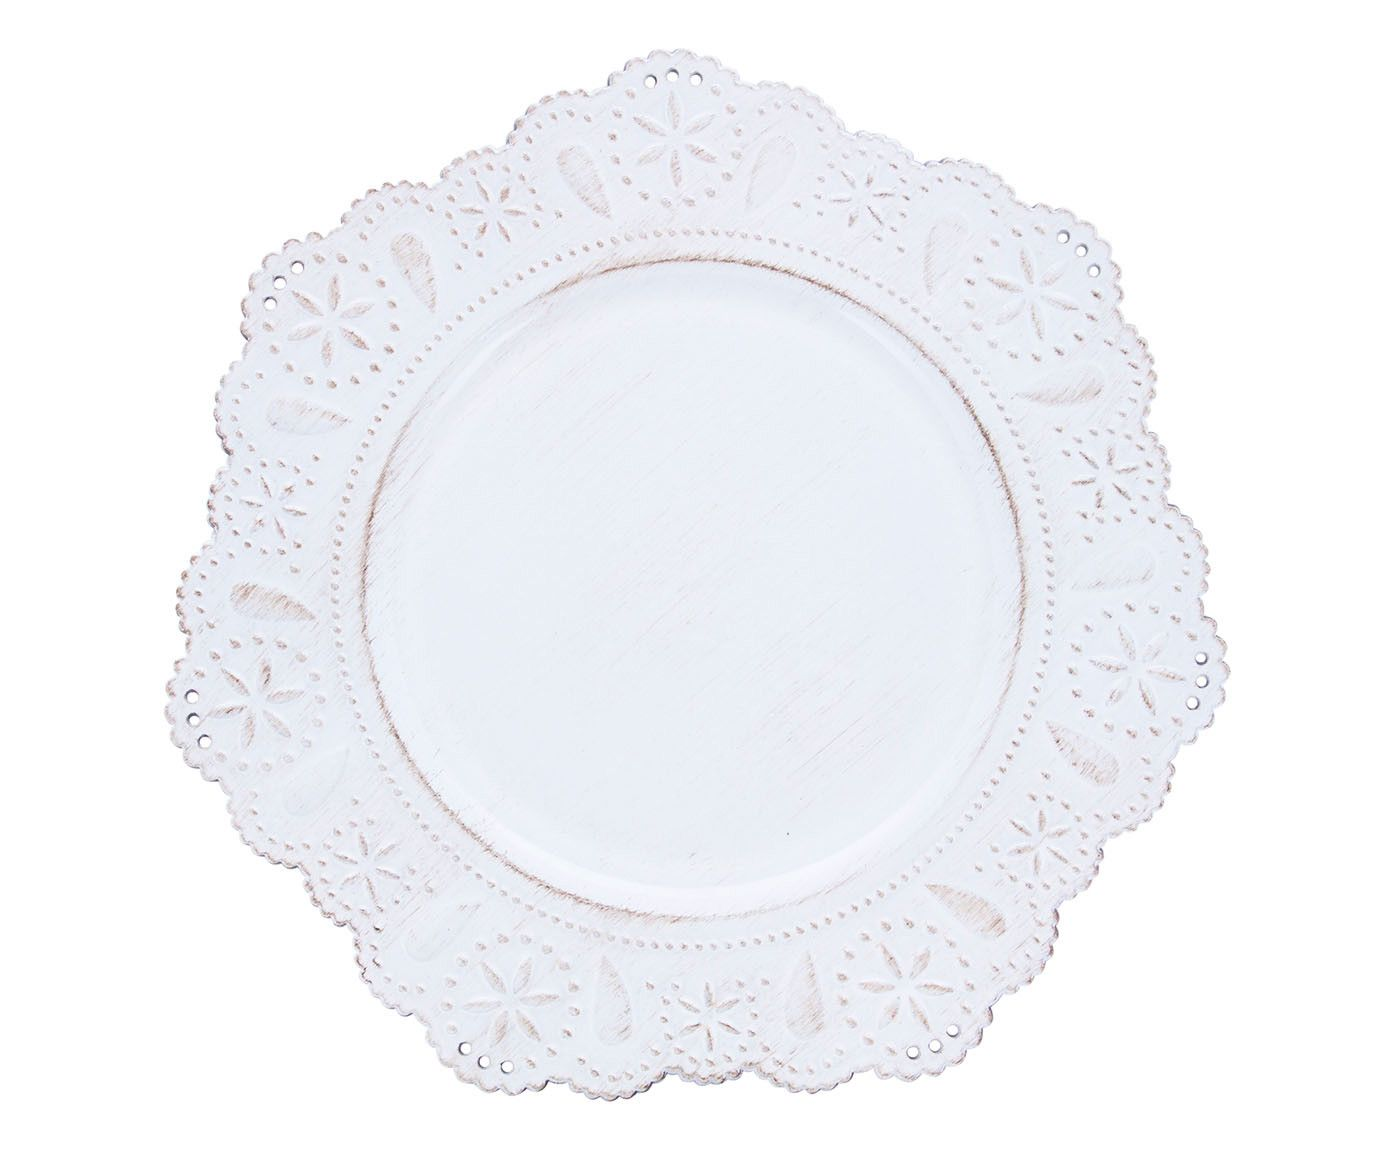 Sousplat Renda Off-White - 33cm | Westwing.com.br